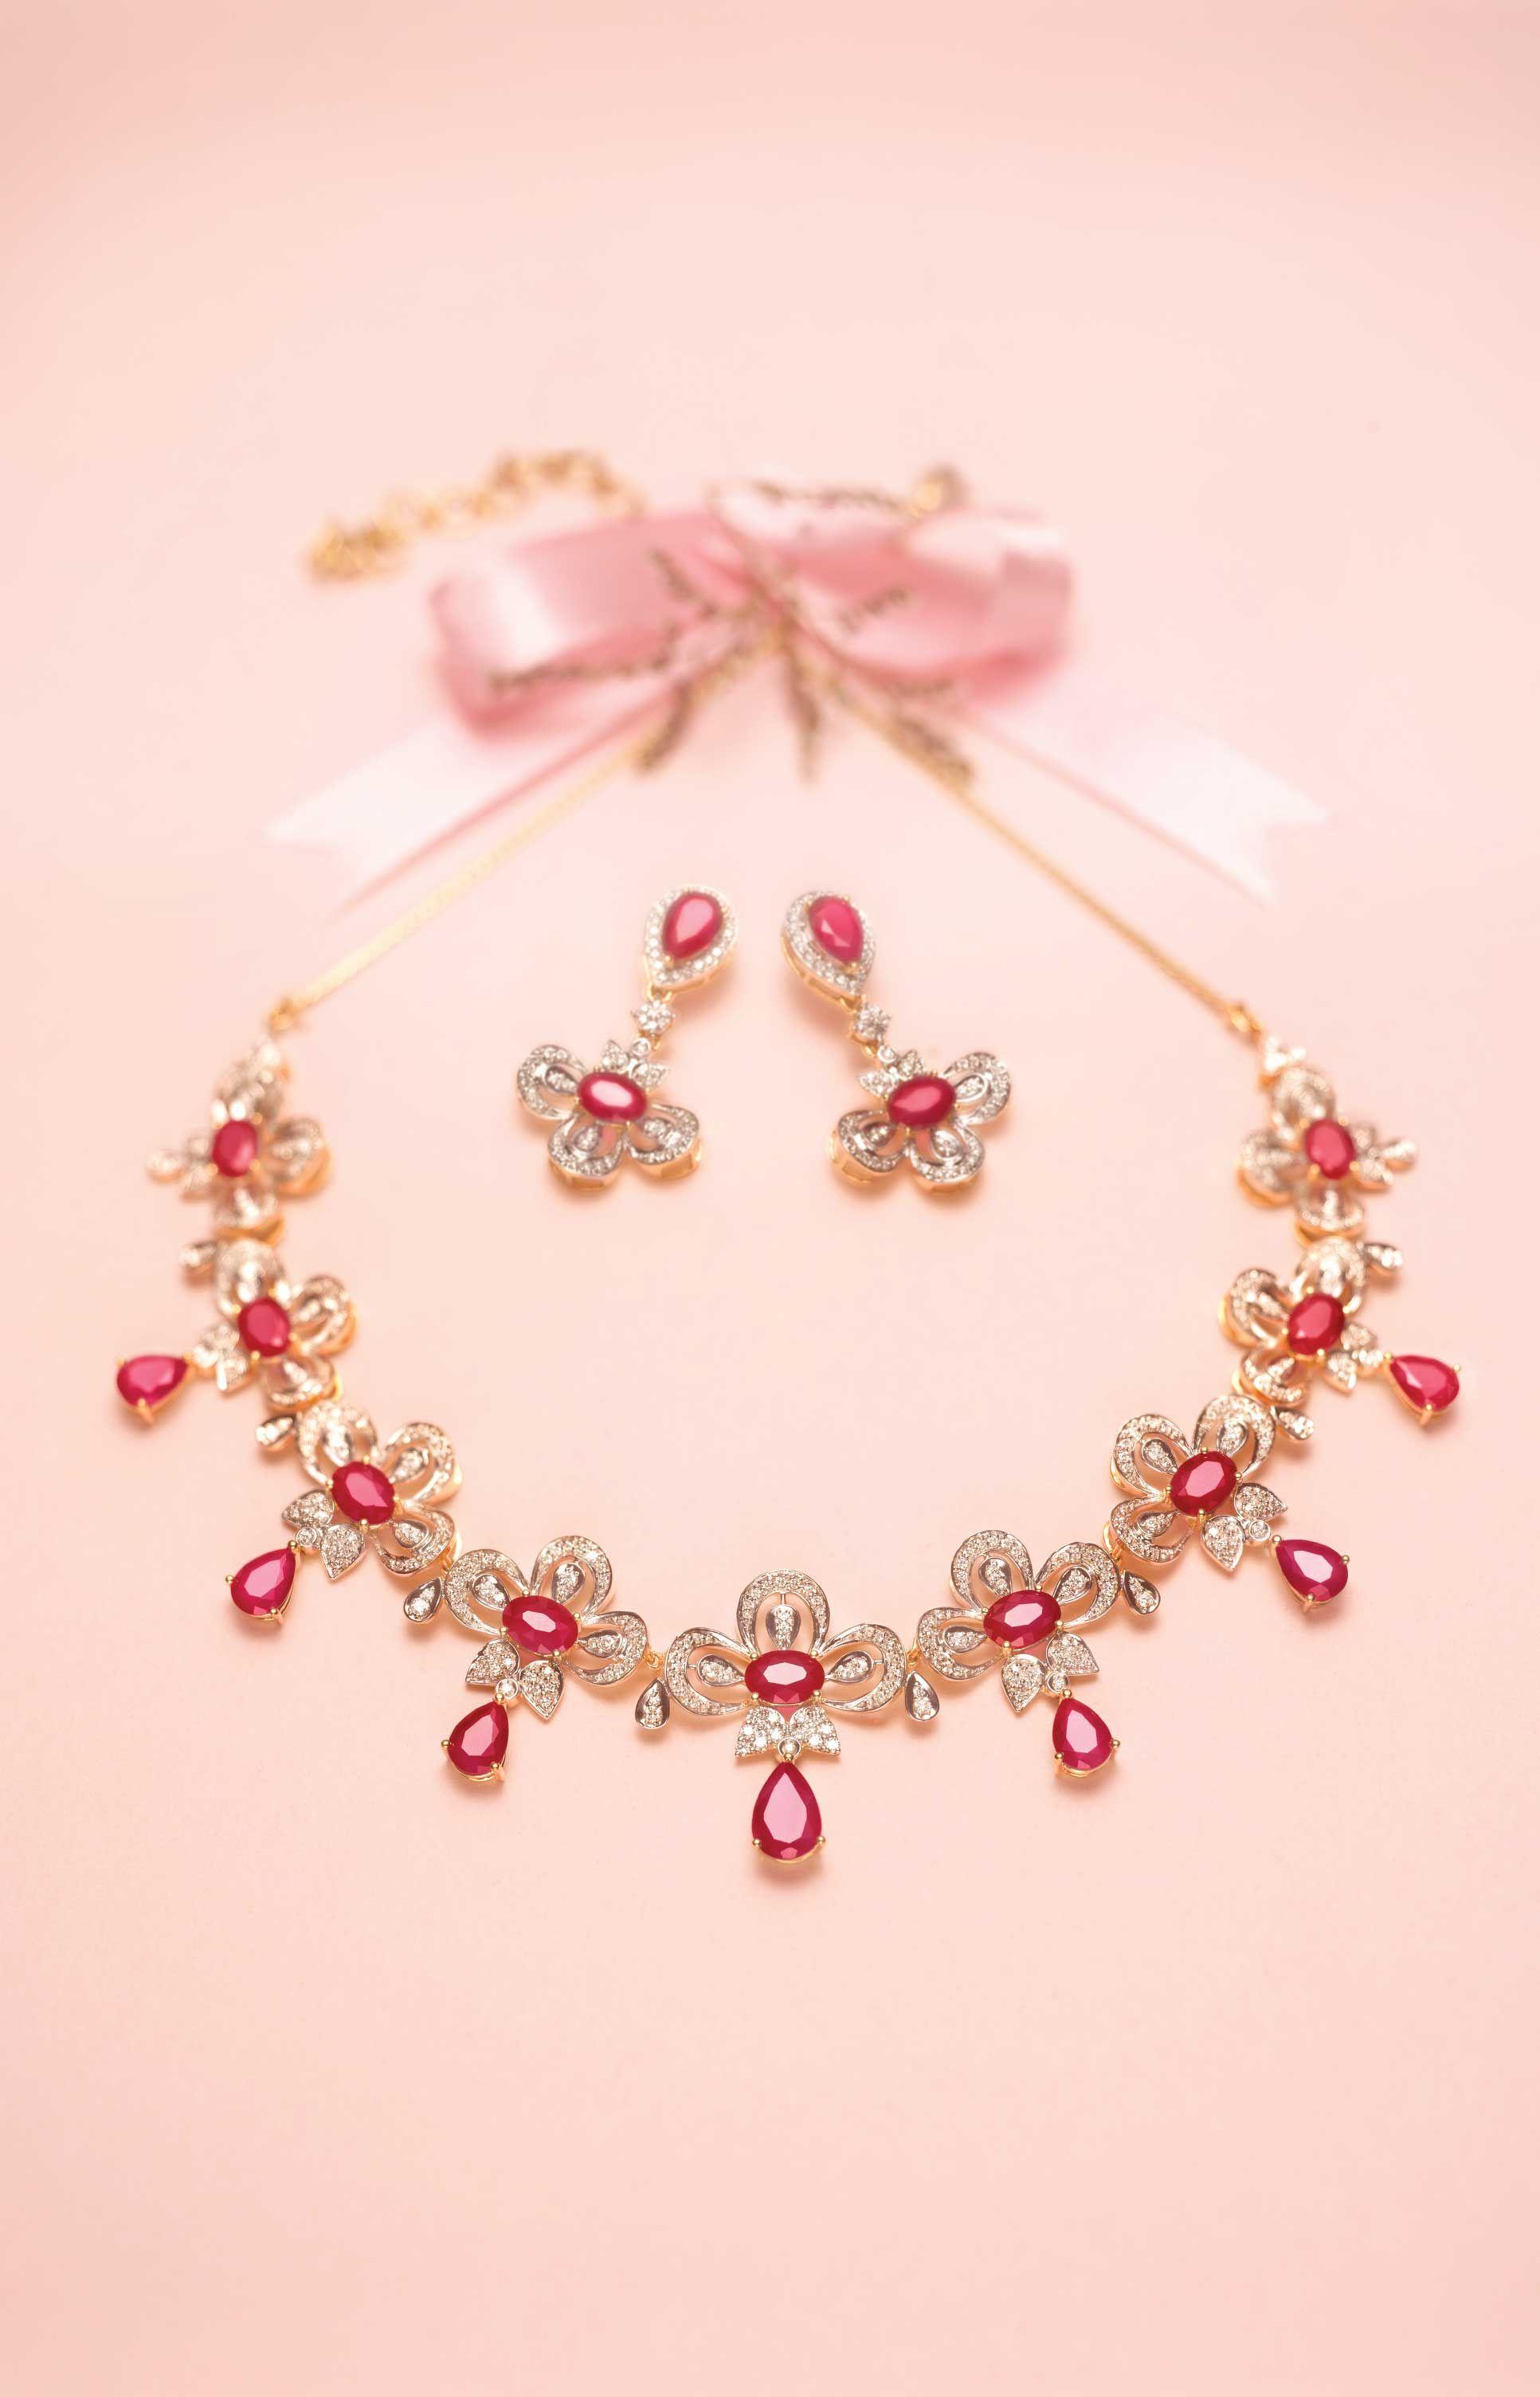 Pin by lêtuyền reynolds on blacktie jewelry pinterest diamond